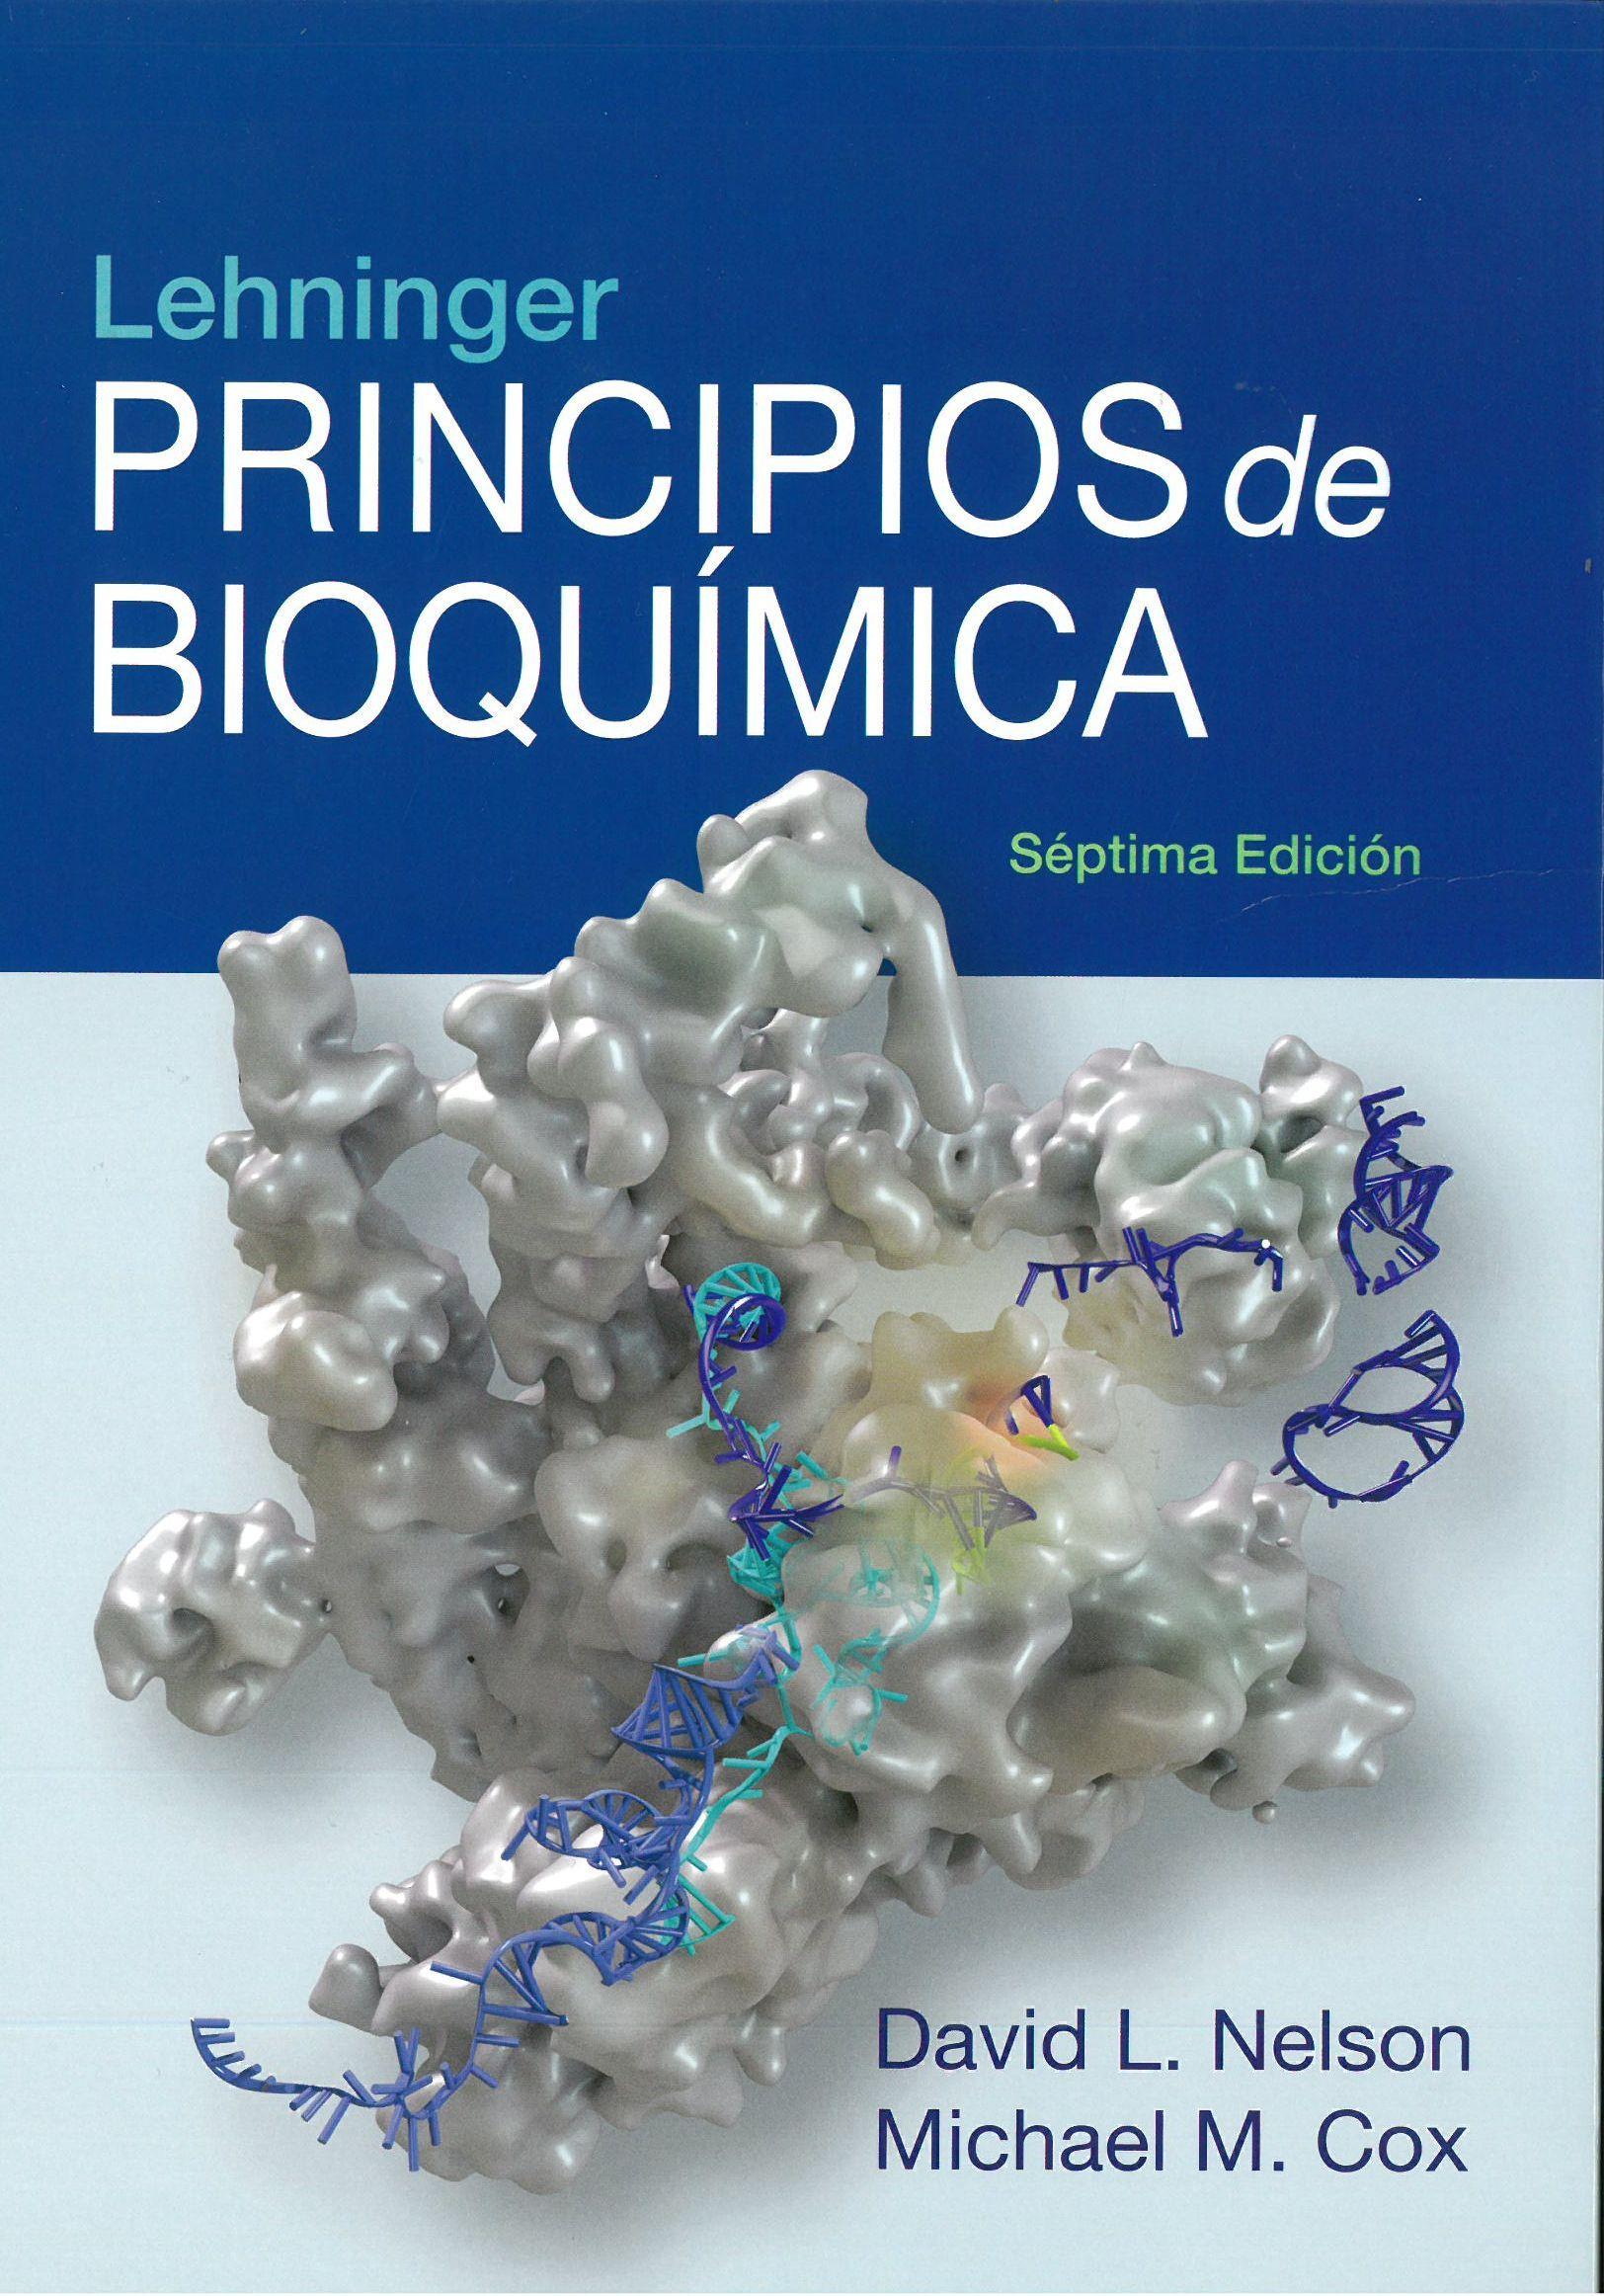 bioquimica de champs descargar gratis